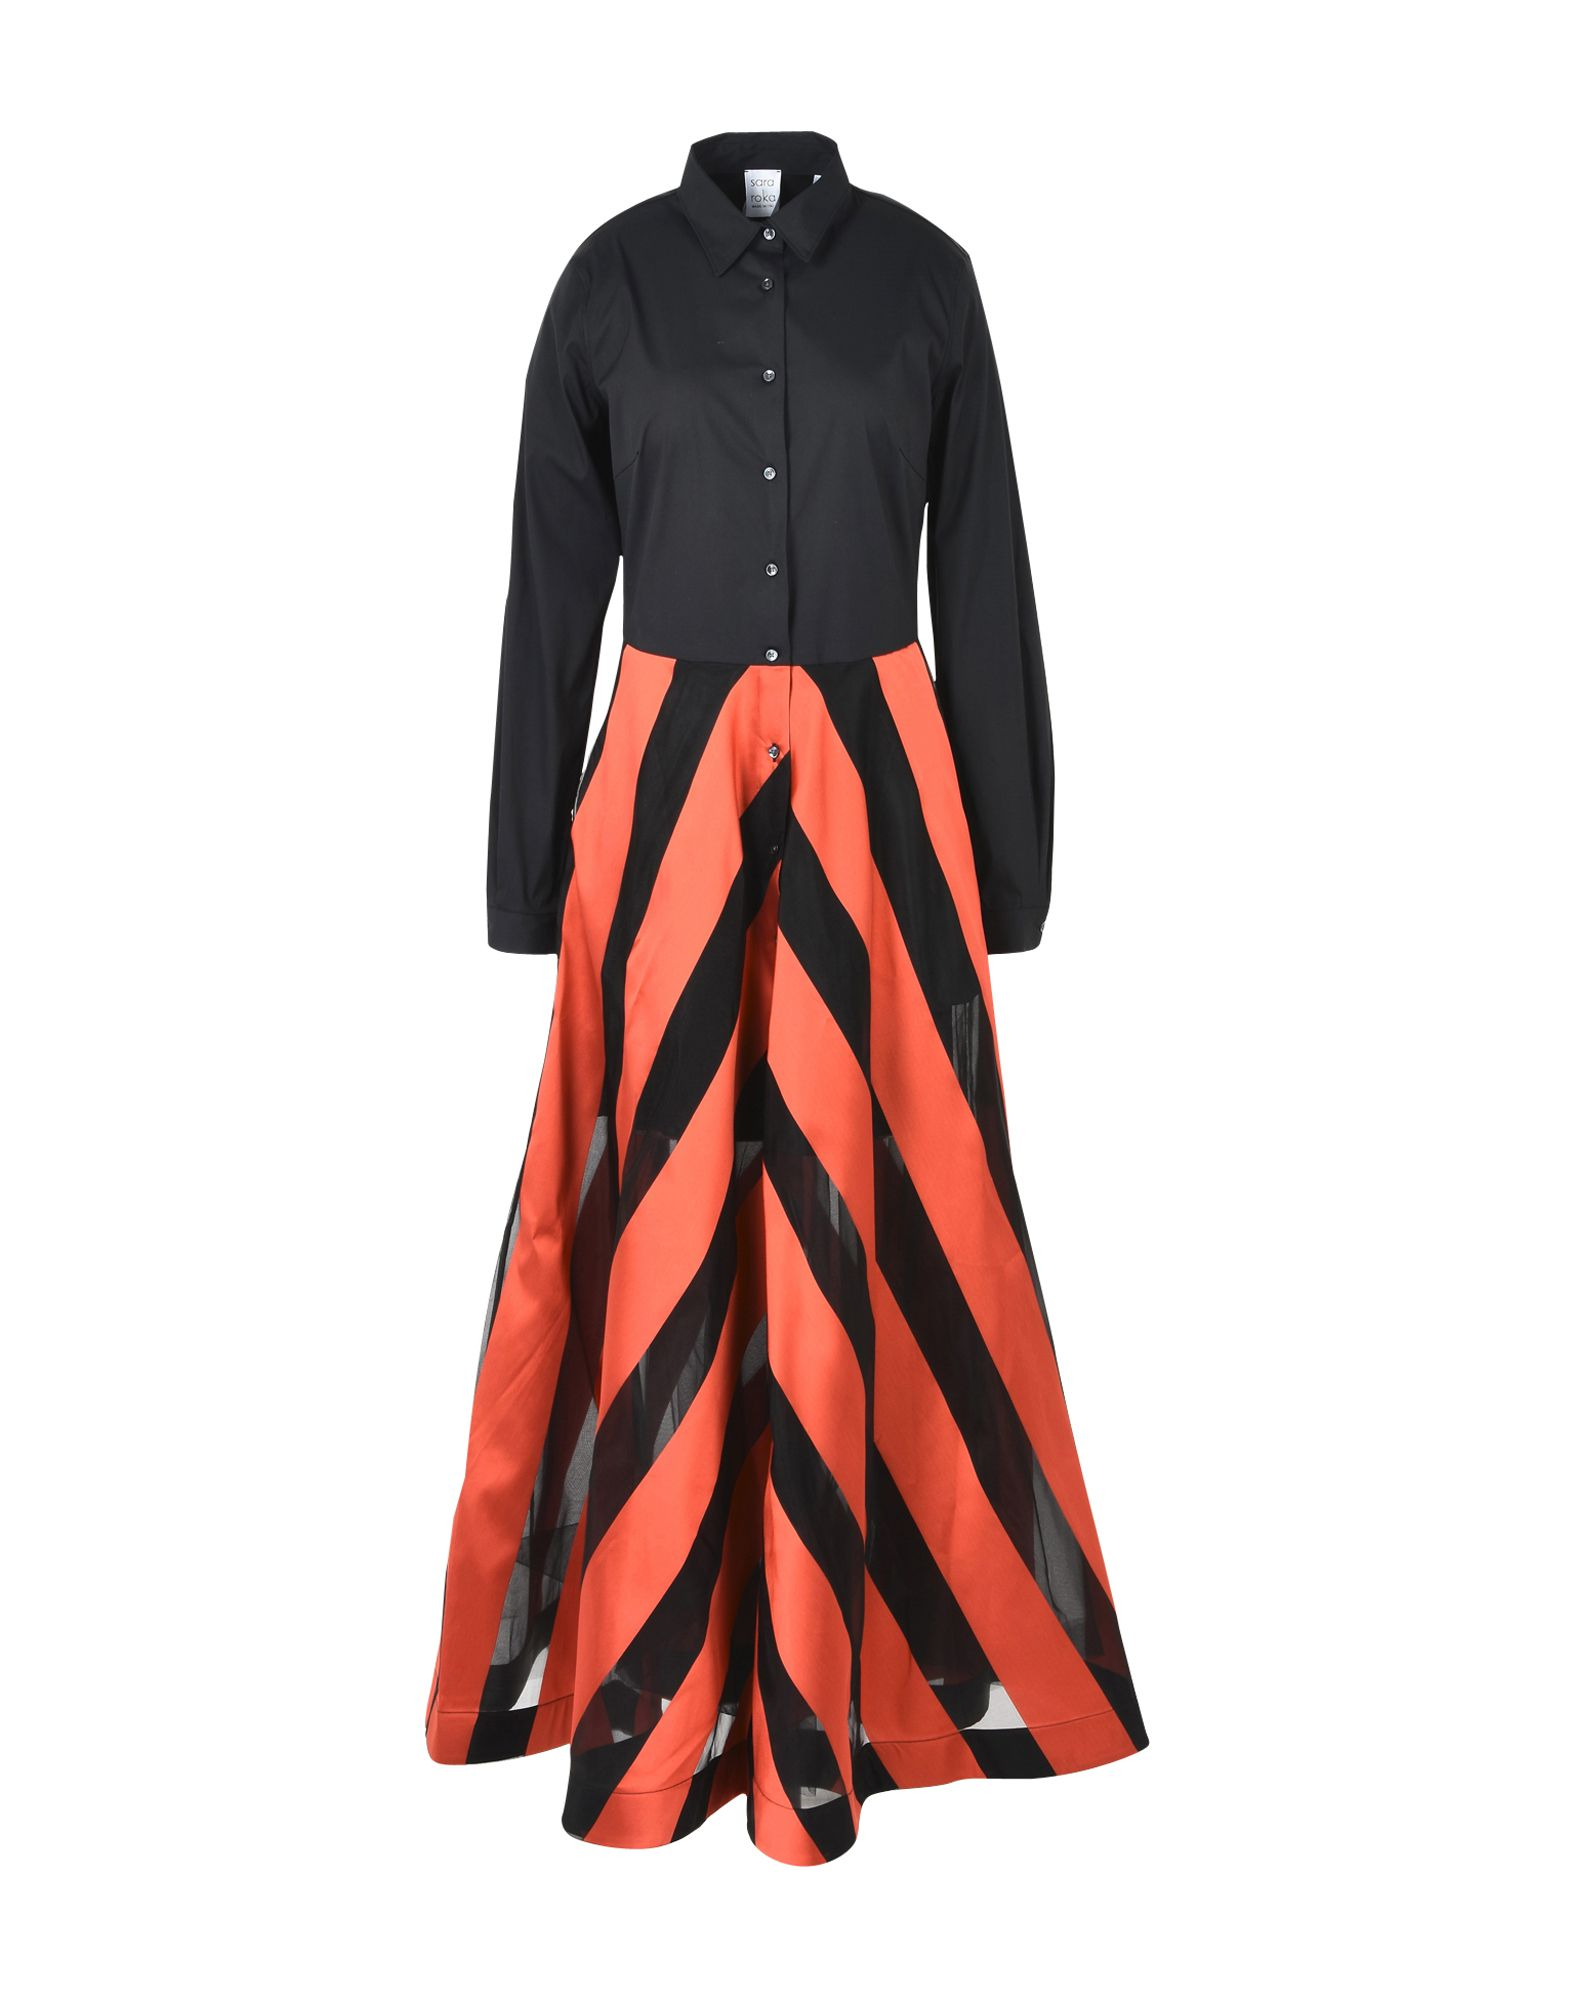 SARA ROKA Длинное платье shoobootique sh017awwps98